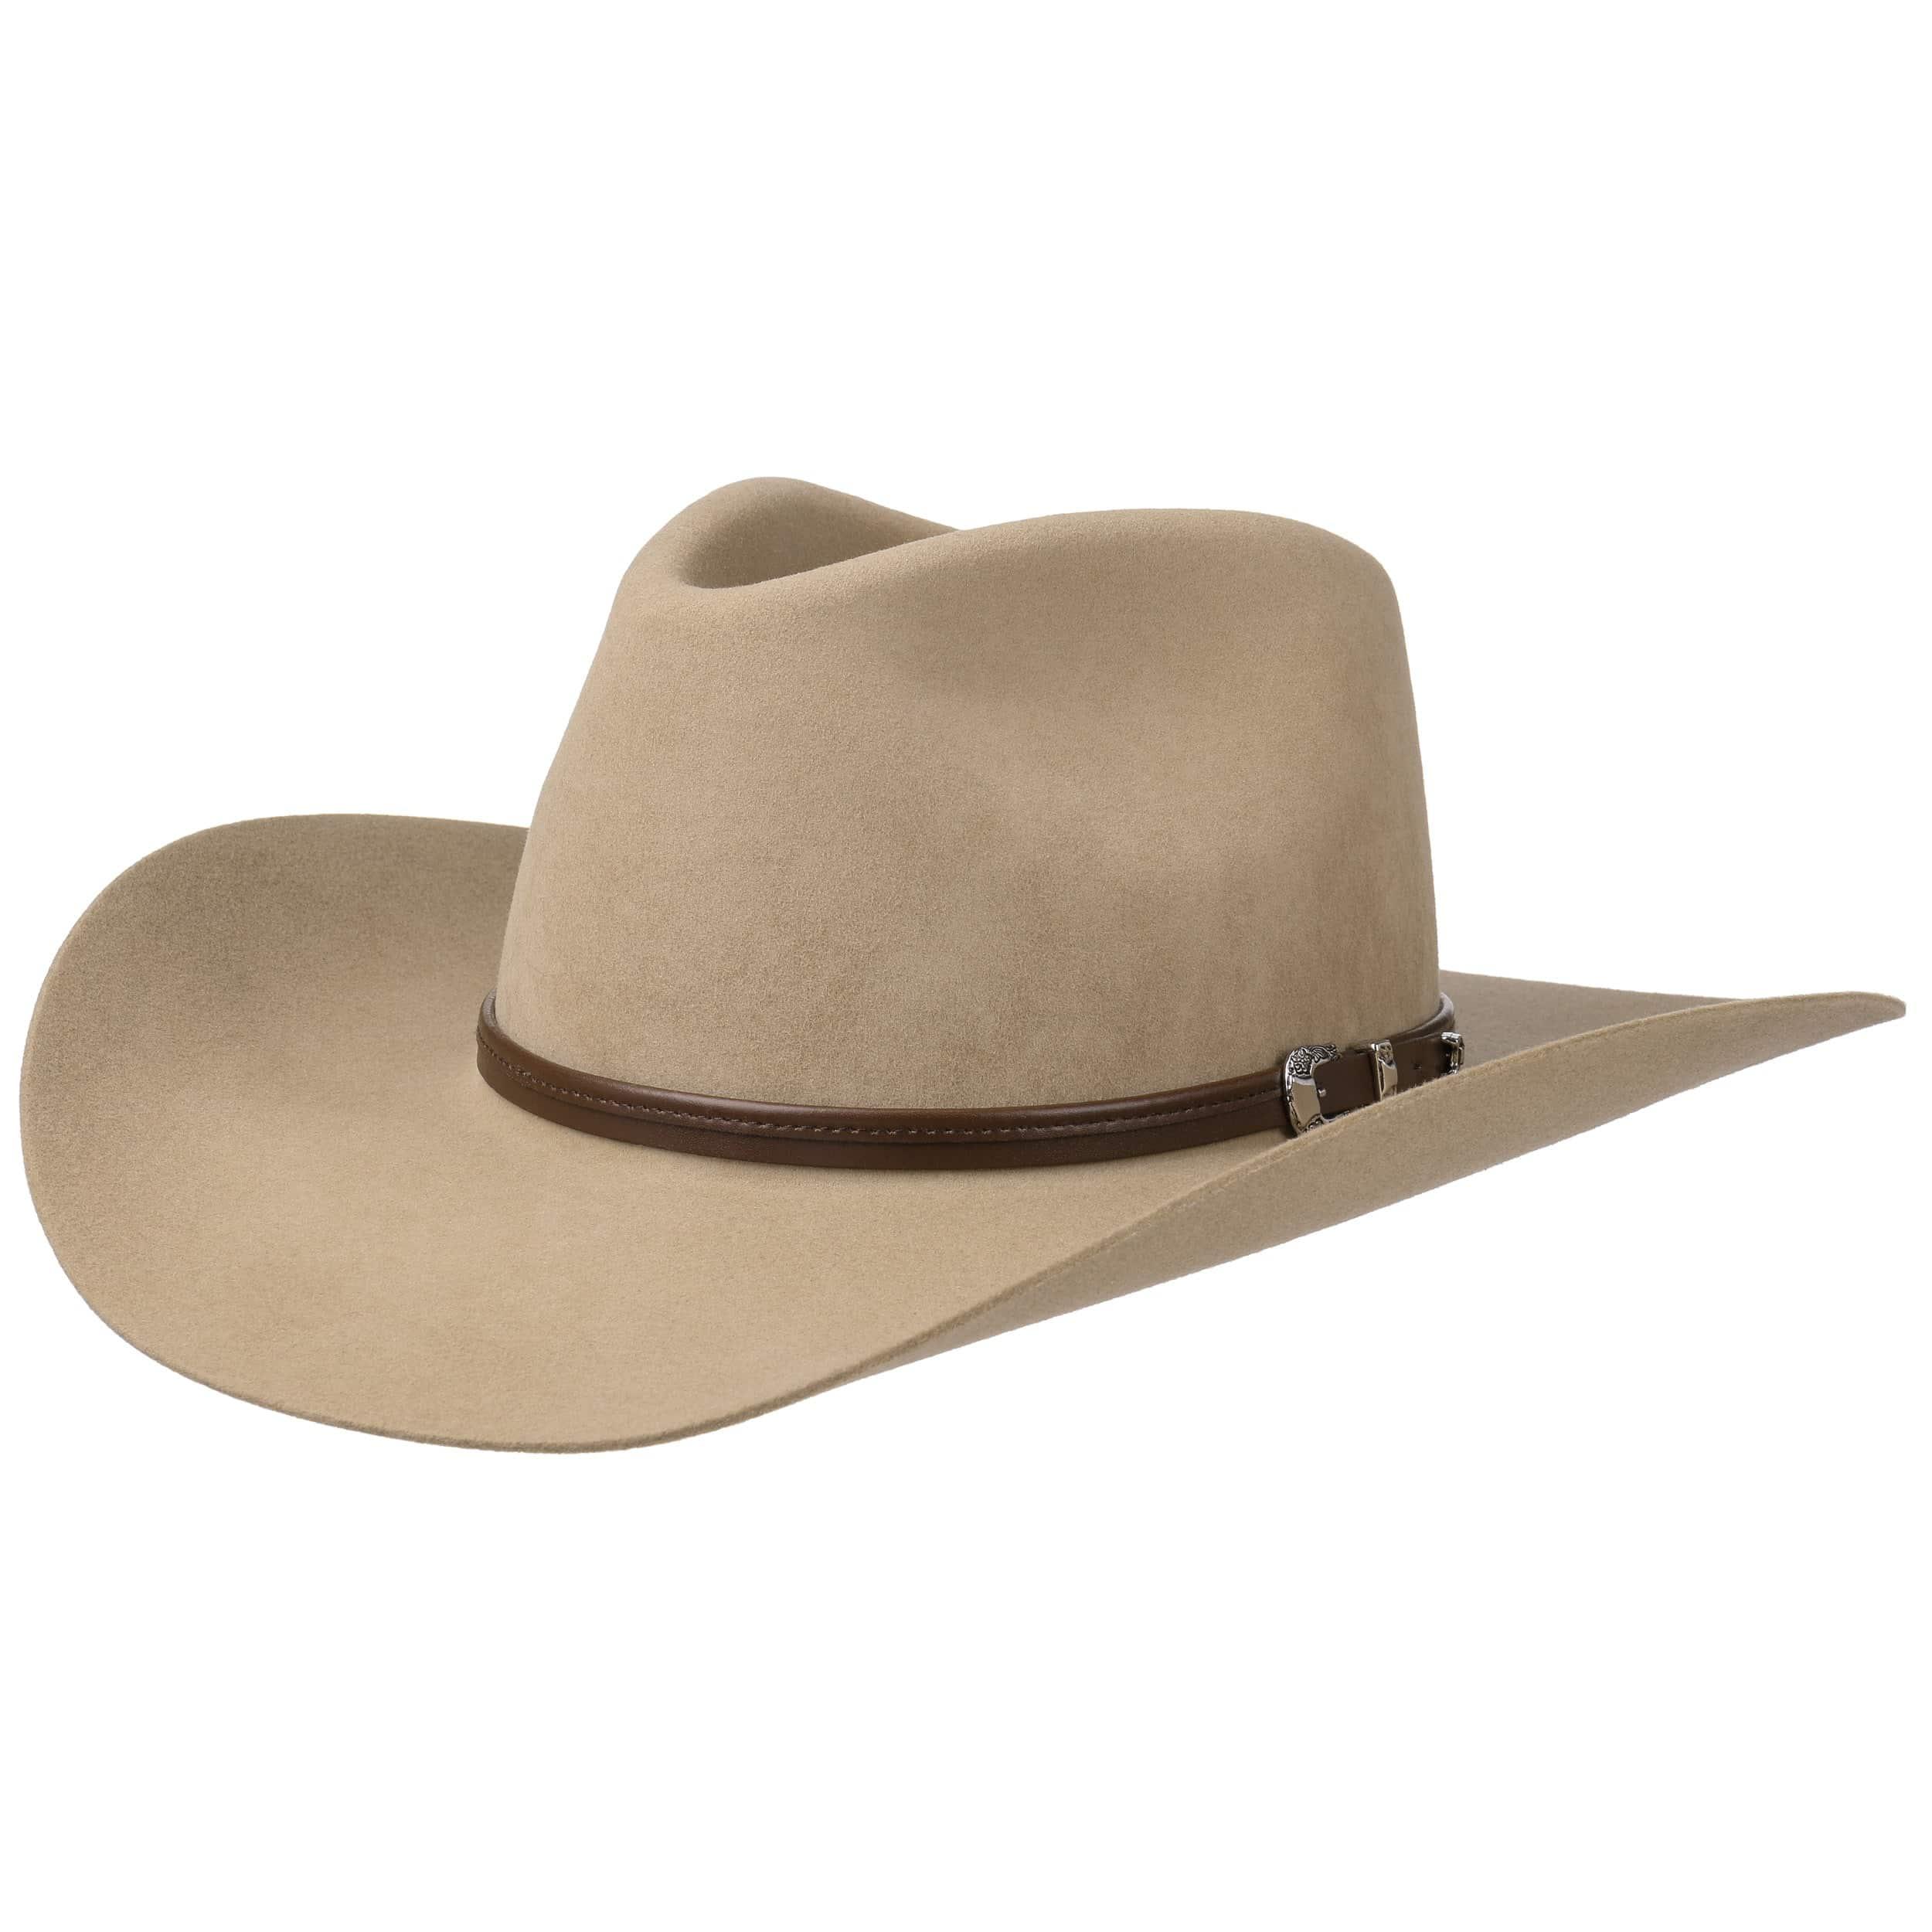 657e254eeed3e Sombrero de Vaquero Seneca 4X by Stetson - Sombreros - sombreroshop.es